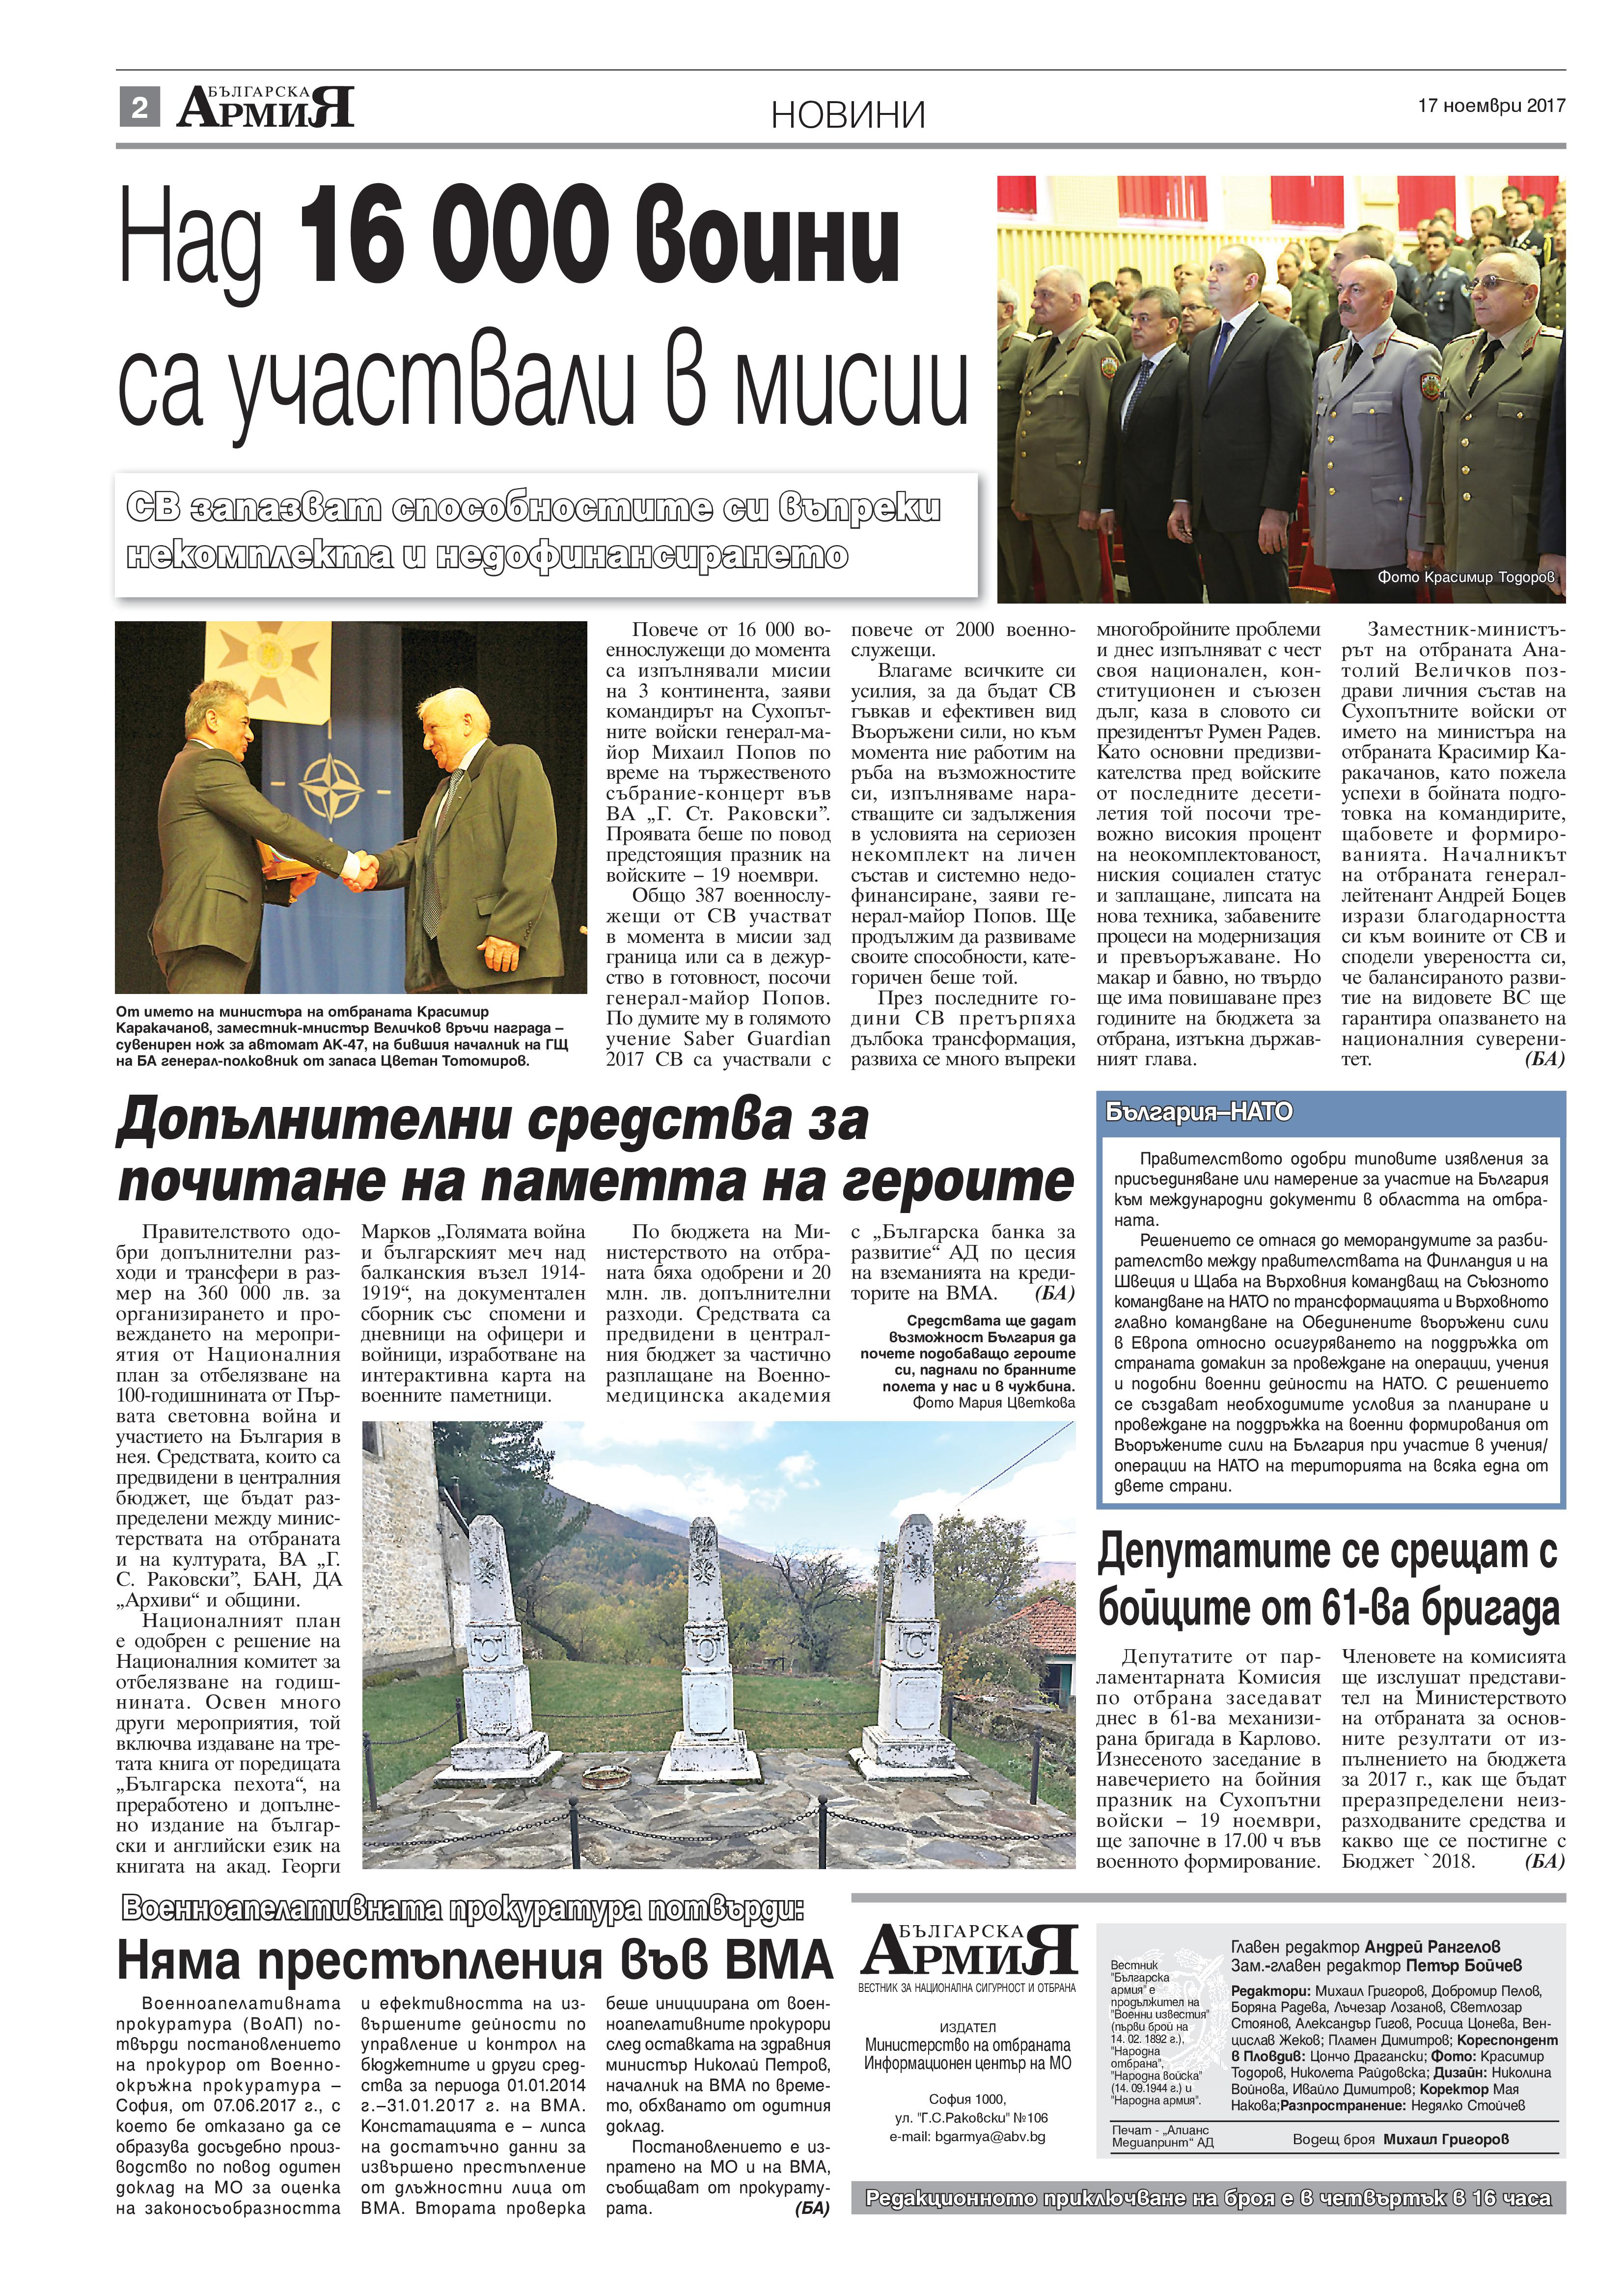 http://armymedia.bg/wp-content/uploads/2015/06/02-11.jpg